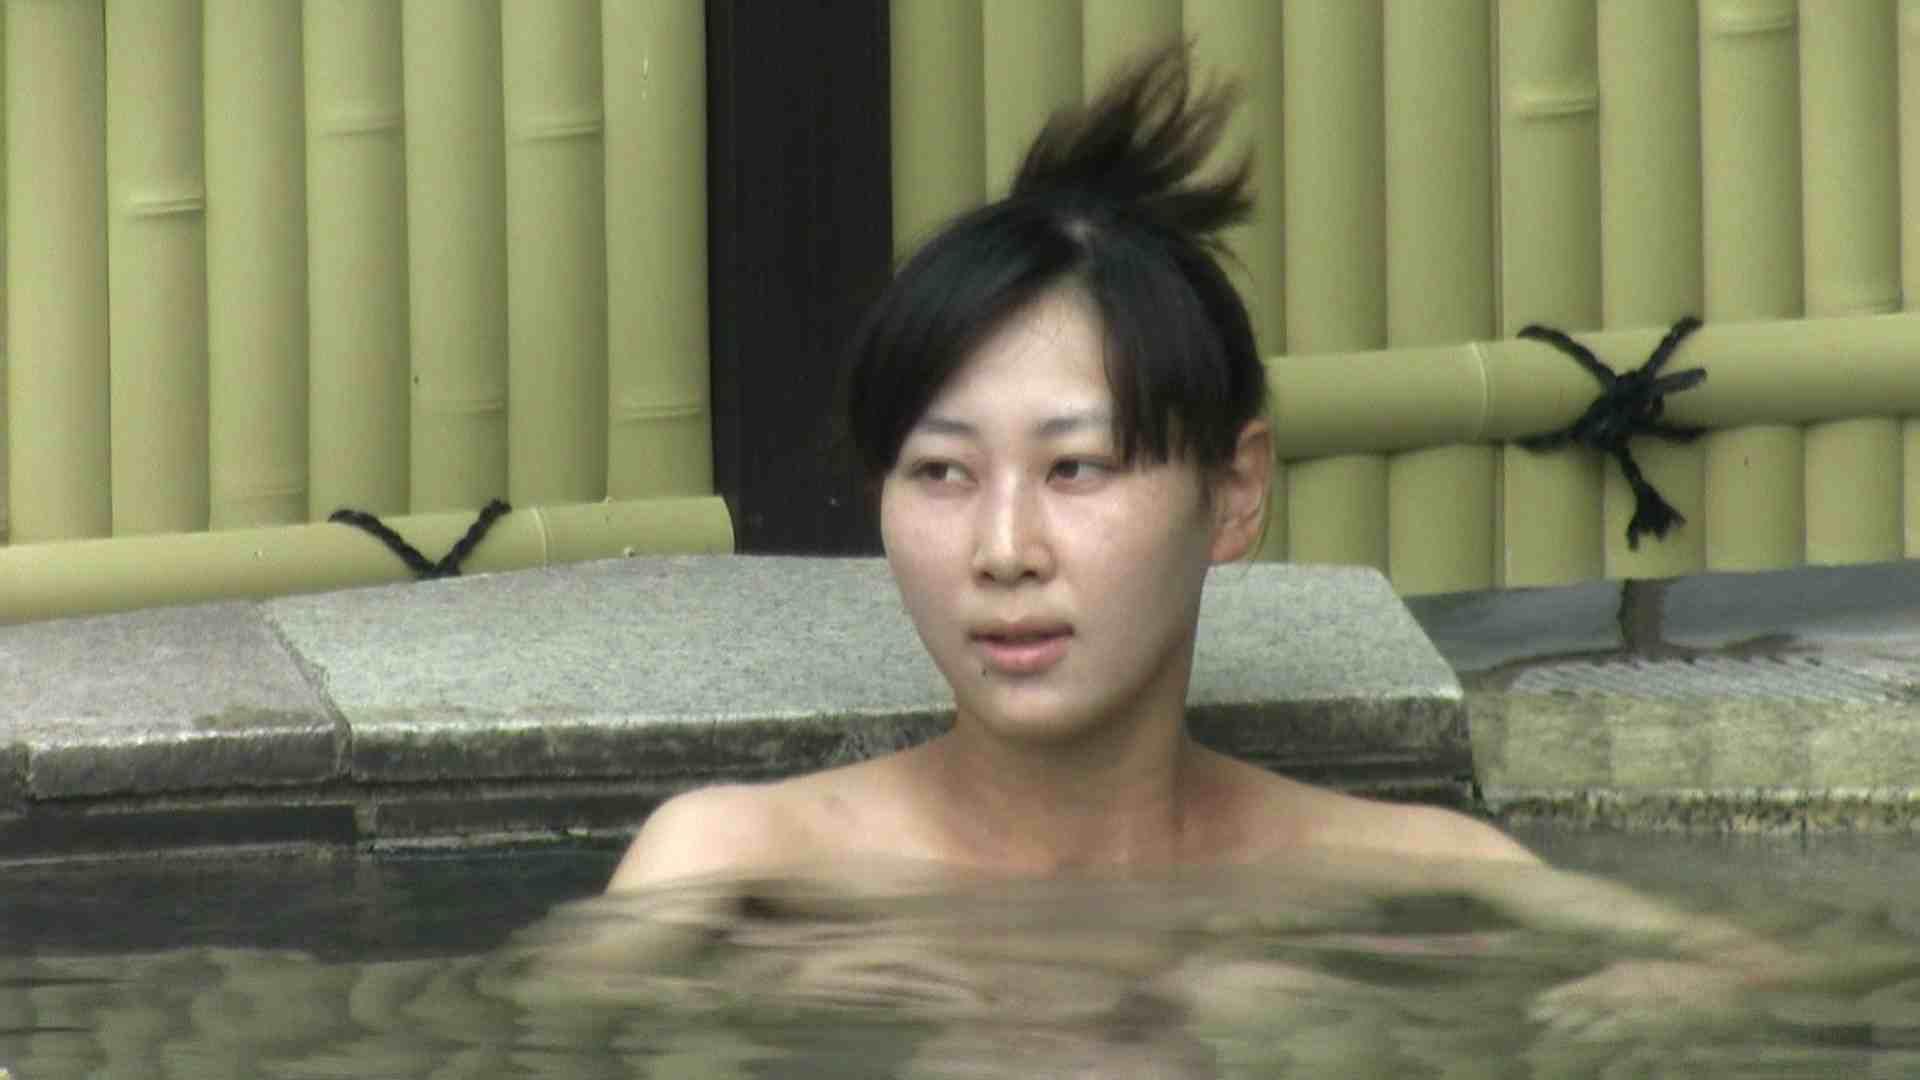 Aquaな露天風呂Vol.665 露天 アダルト動画キャプチャ 85枚 47